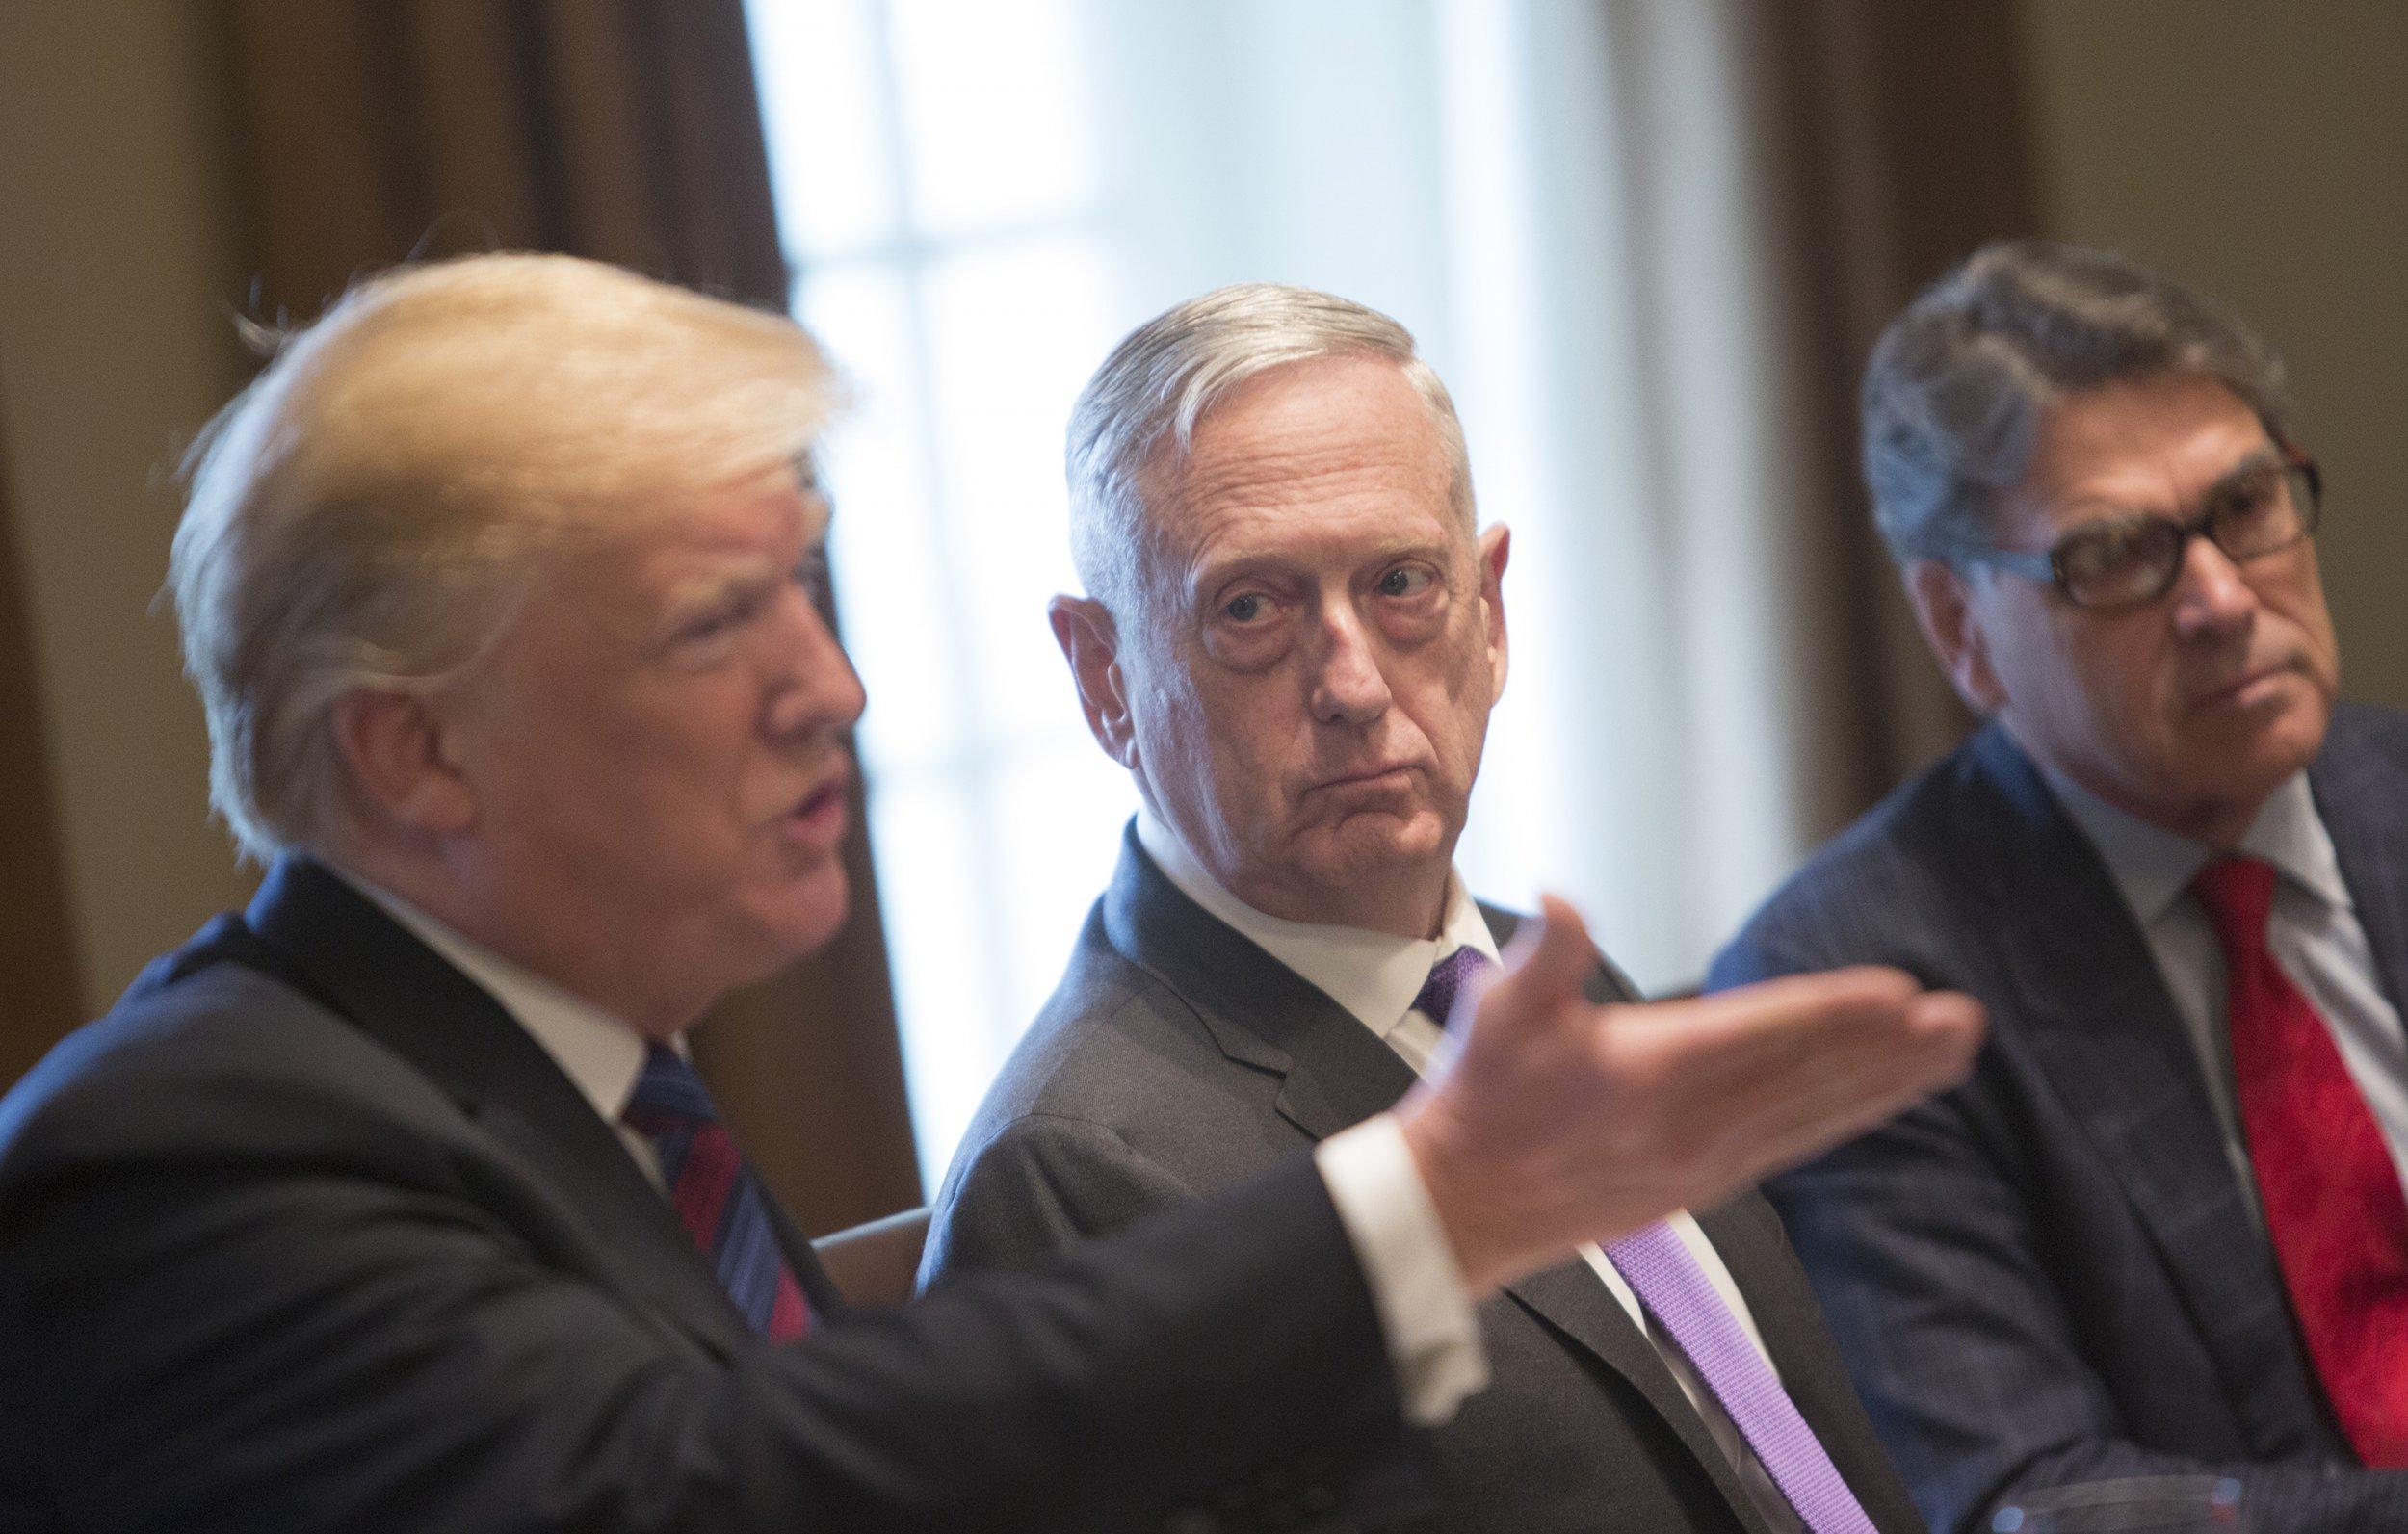 Trump is Tiring of Defense Secretary James Mattis, Thinks He is Secretly a Democrat